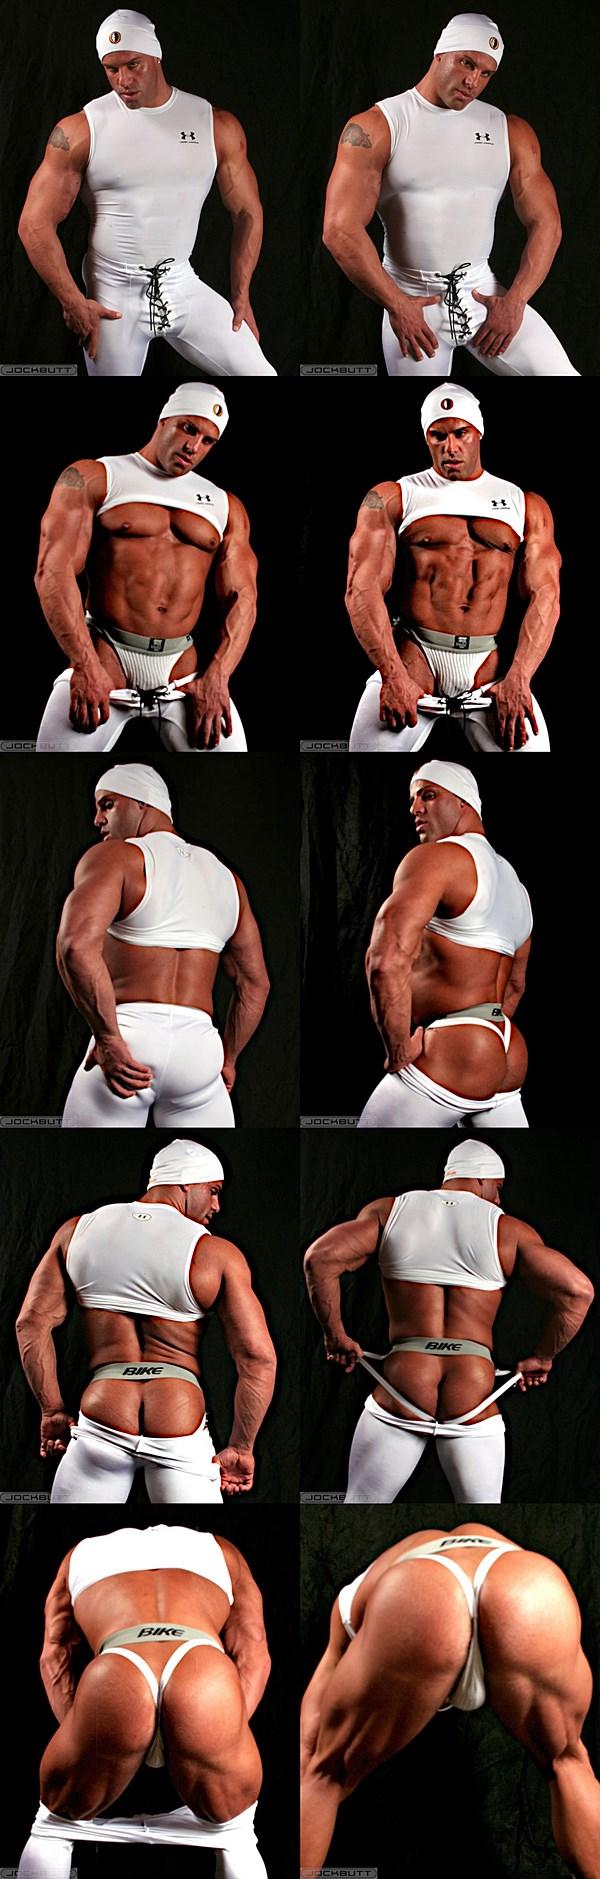 Masculine rugged hunk Peter Latz show off his hard muscles and big sexy ass at Jockbutt